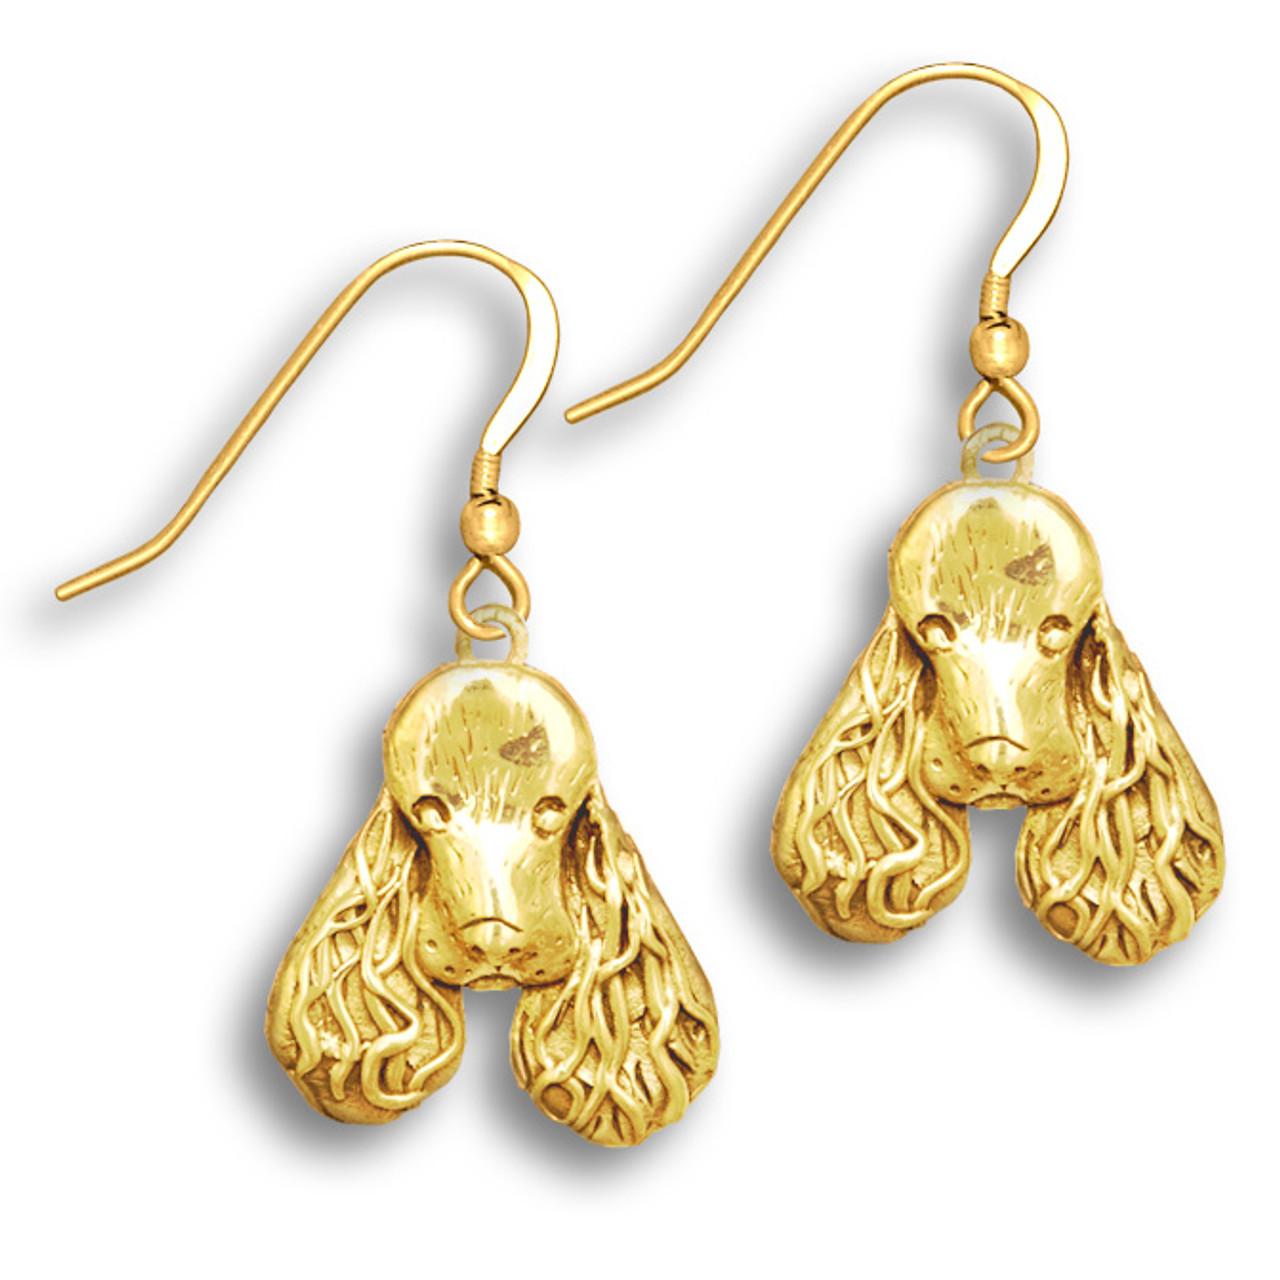 Spaniel Charm Earrings